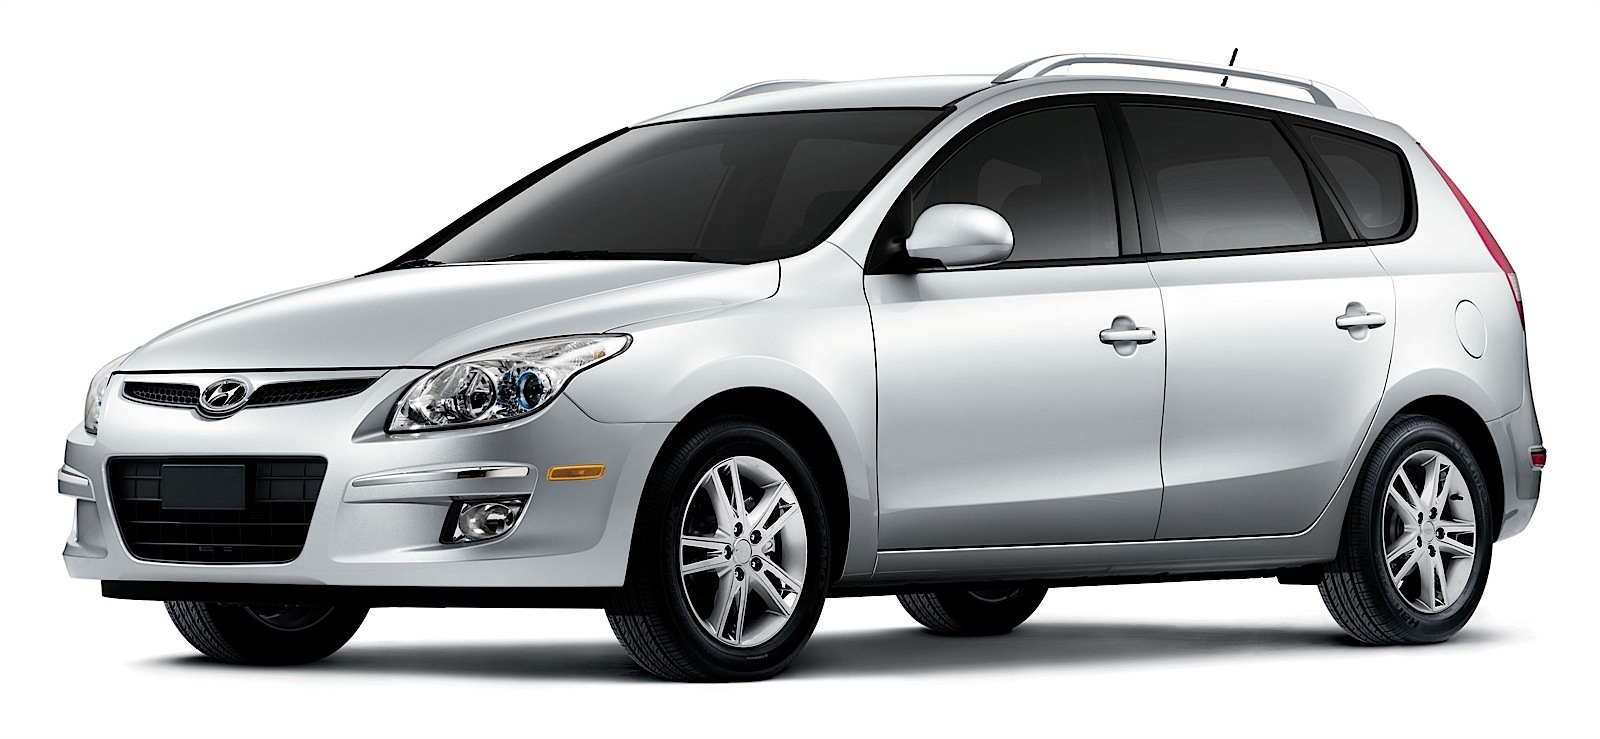 Hyundai Elantra Touring Specs Amp Photos 2009 2010 2011